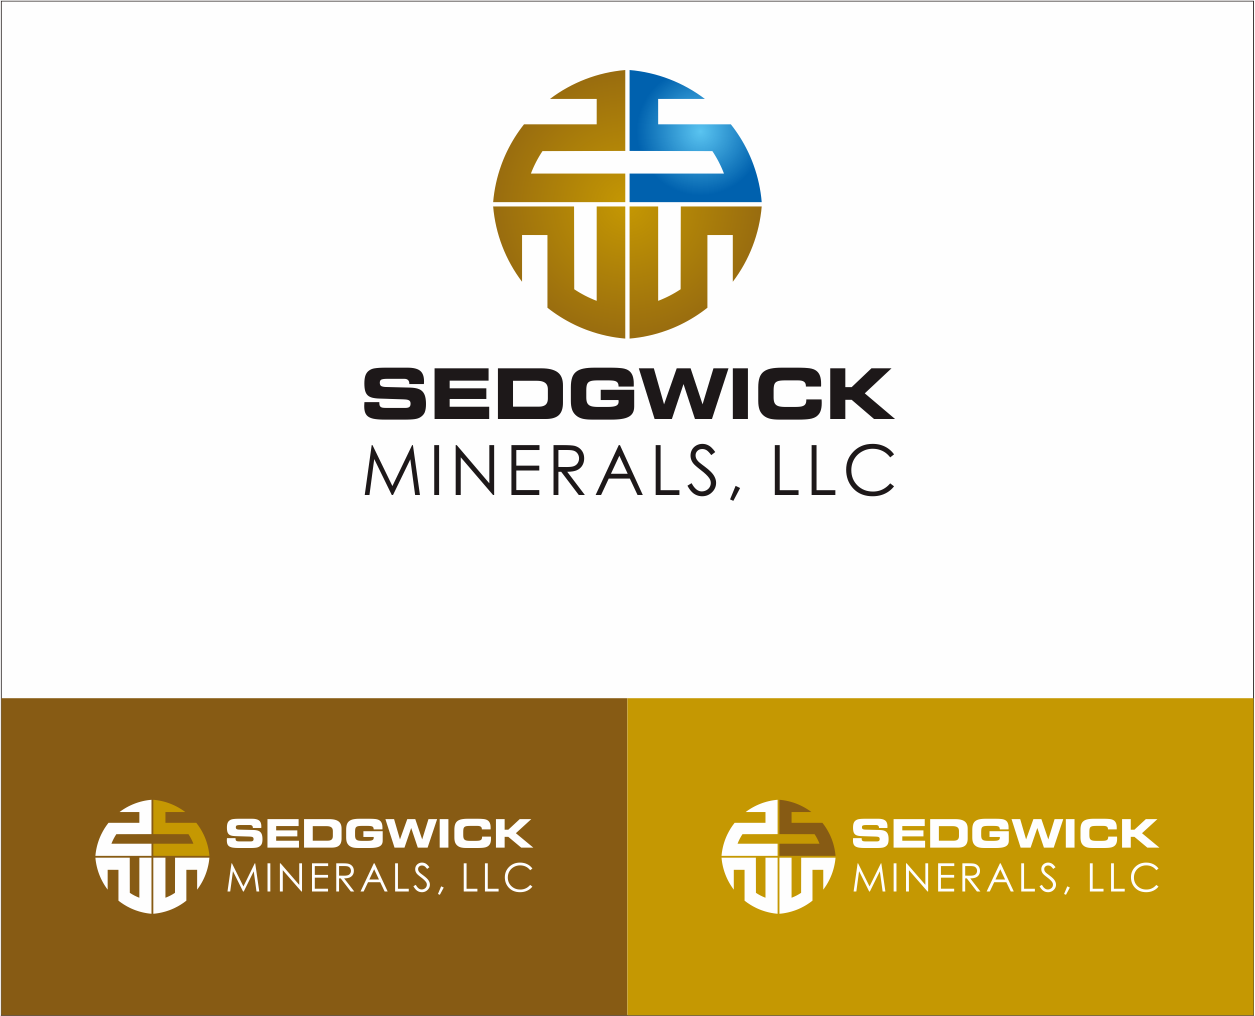 Logo Design by Armada Jamaluddin - Entry No. 73 in the Logo Design Contest Inspiring Logo Design for Sedgwick Minerals, LLC.